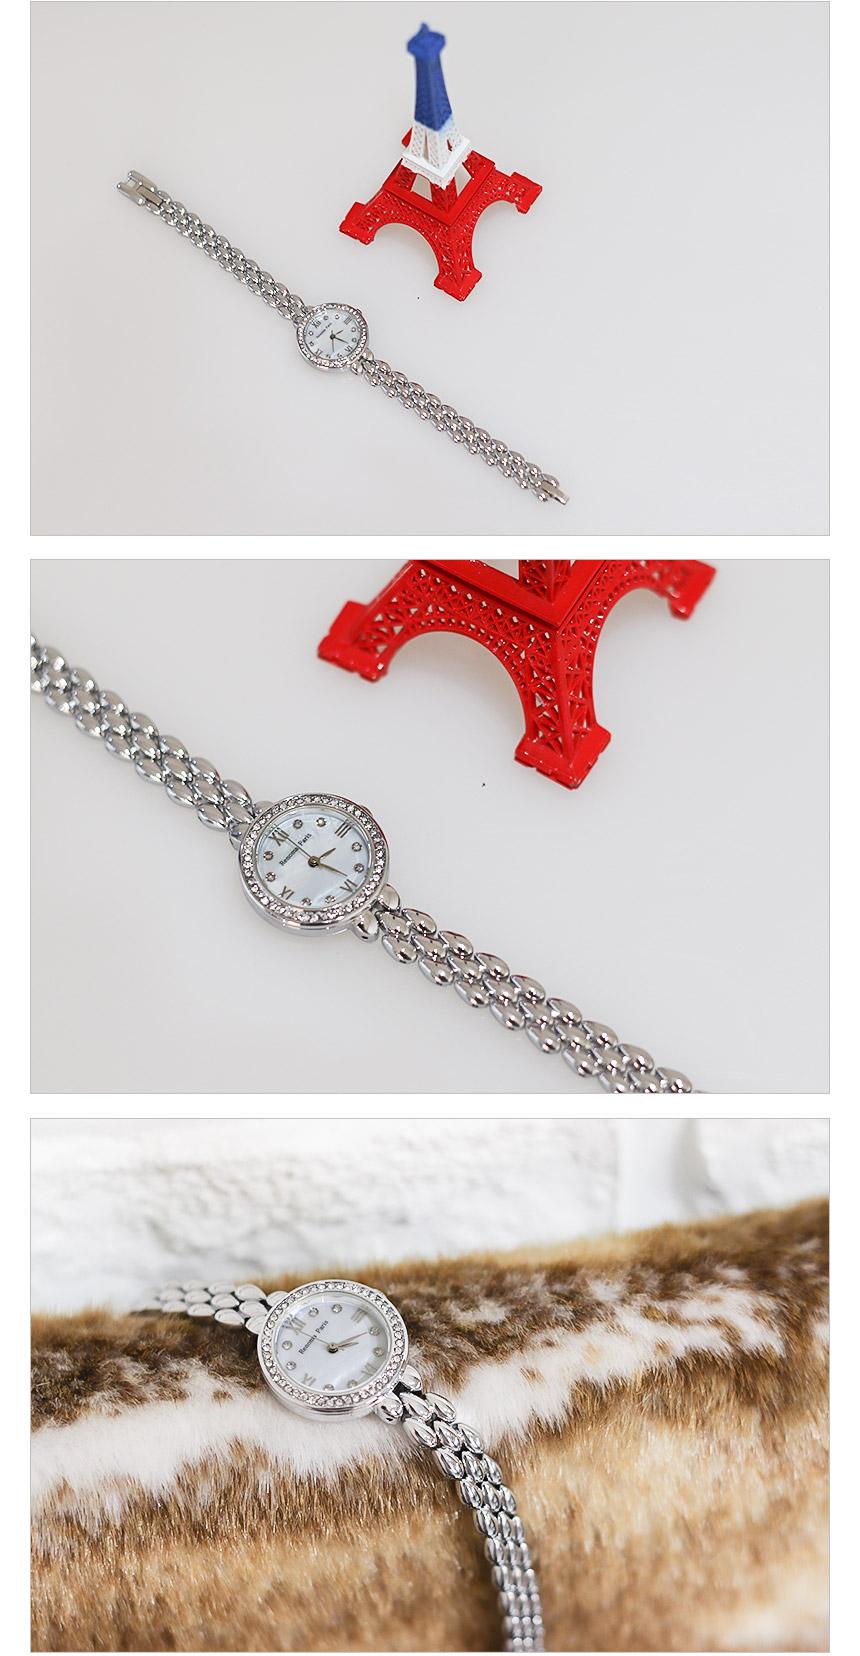 RE515 여성메탈시계/본사직영/AS가능 - 란쯔, 148,000원, 여성시계, 메탈시계